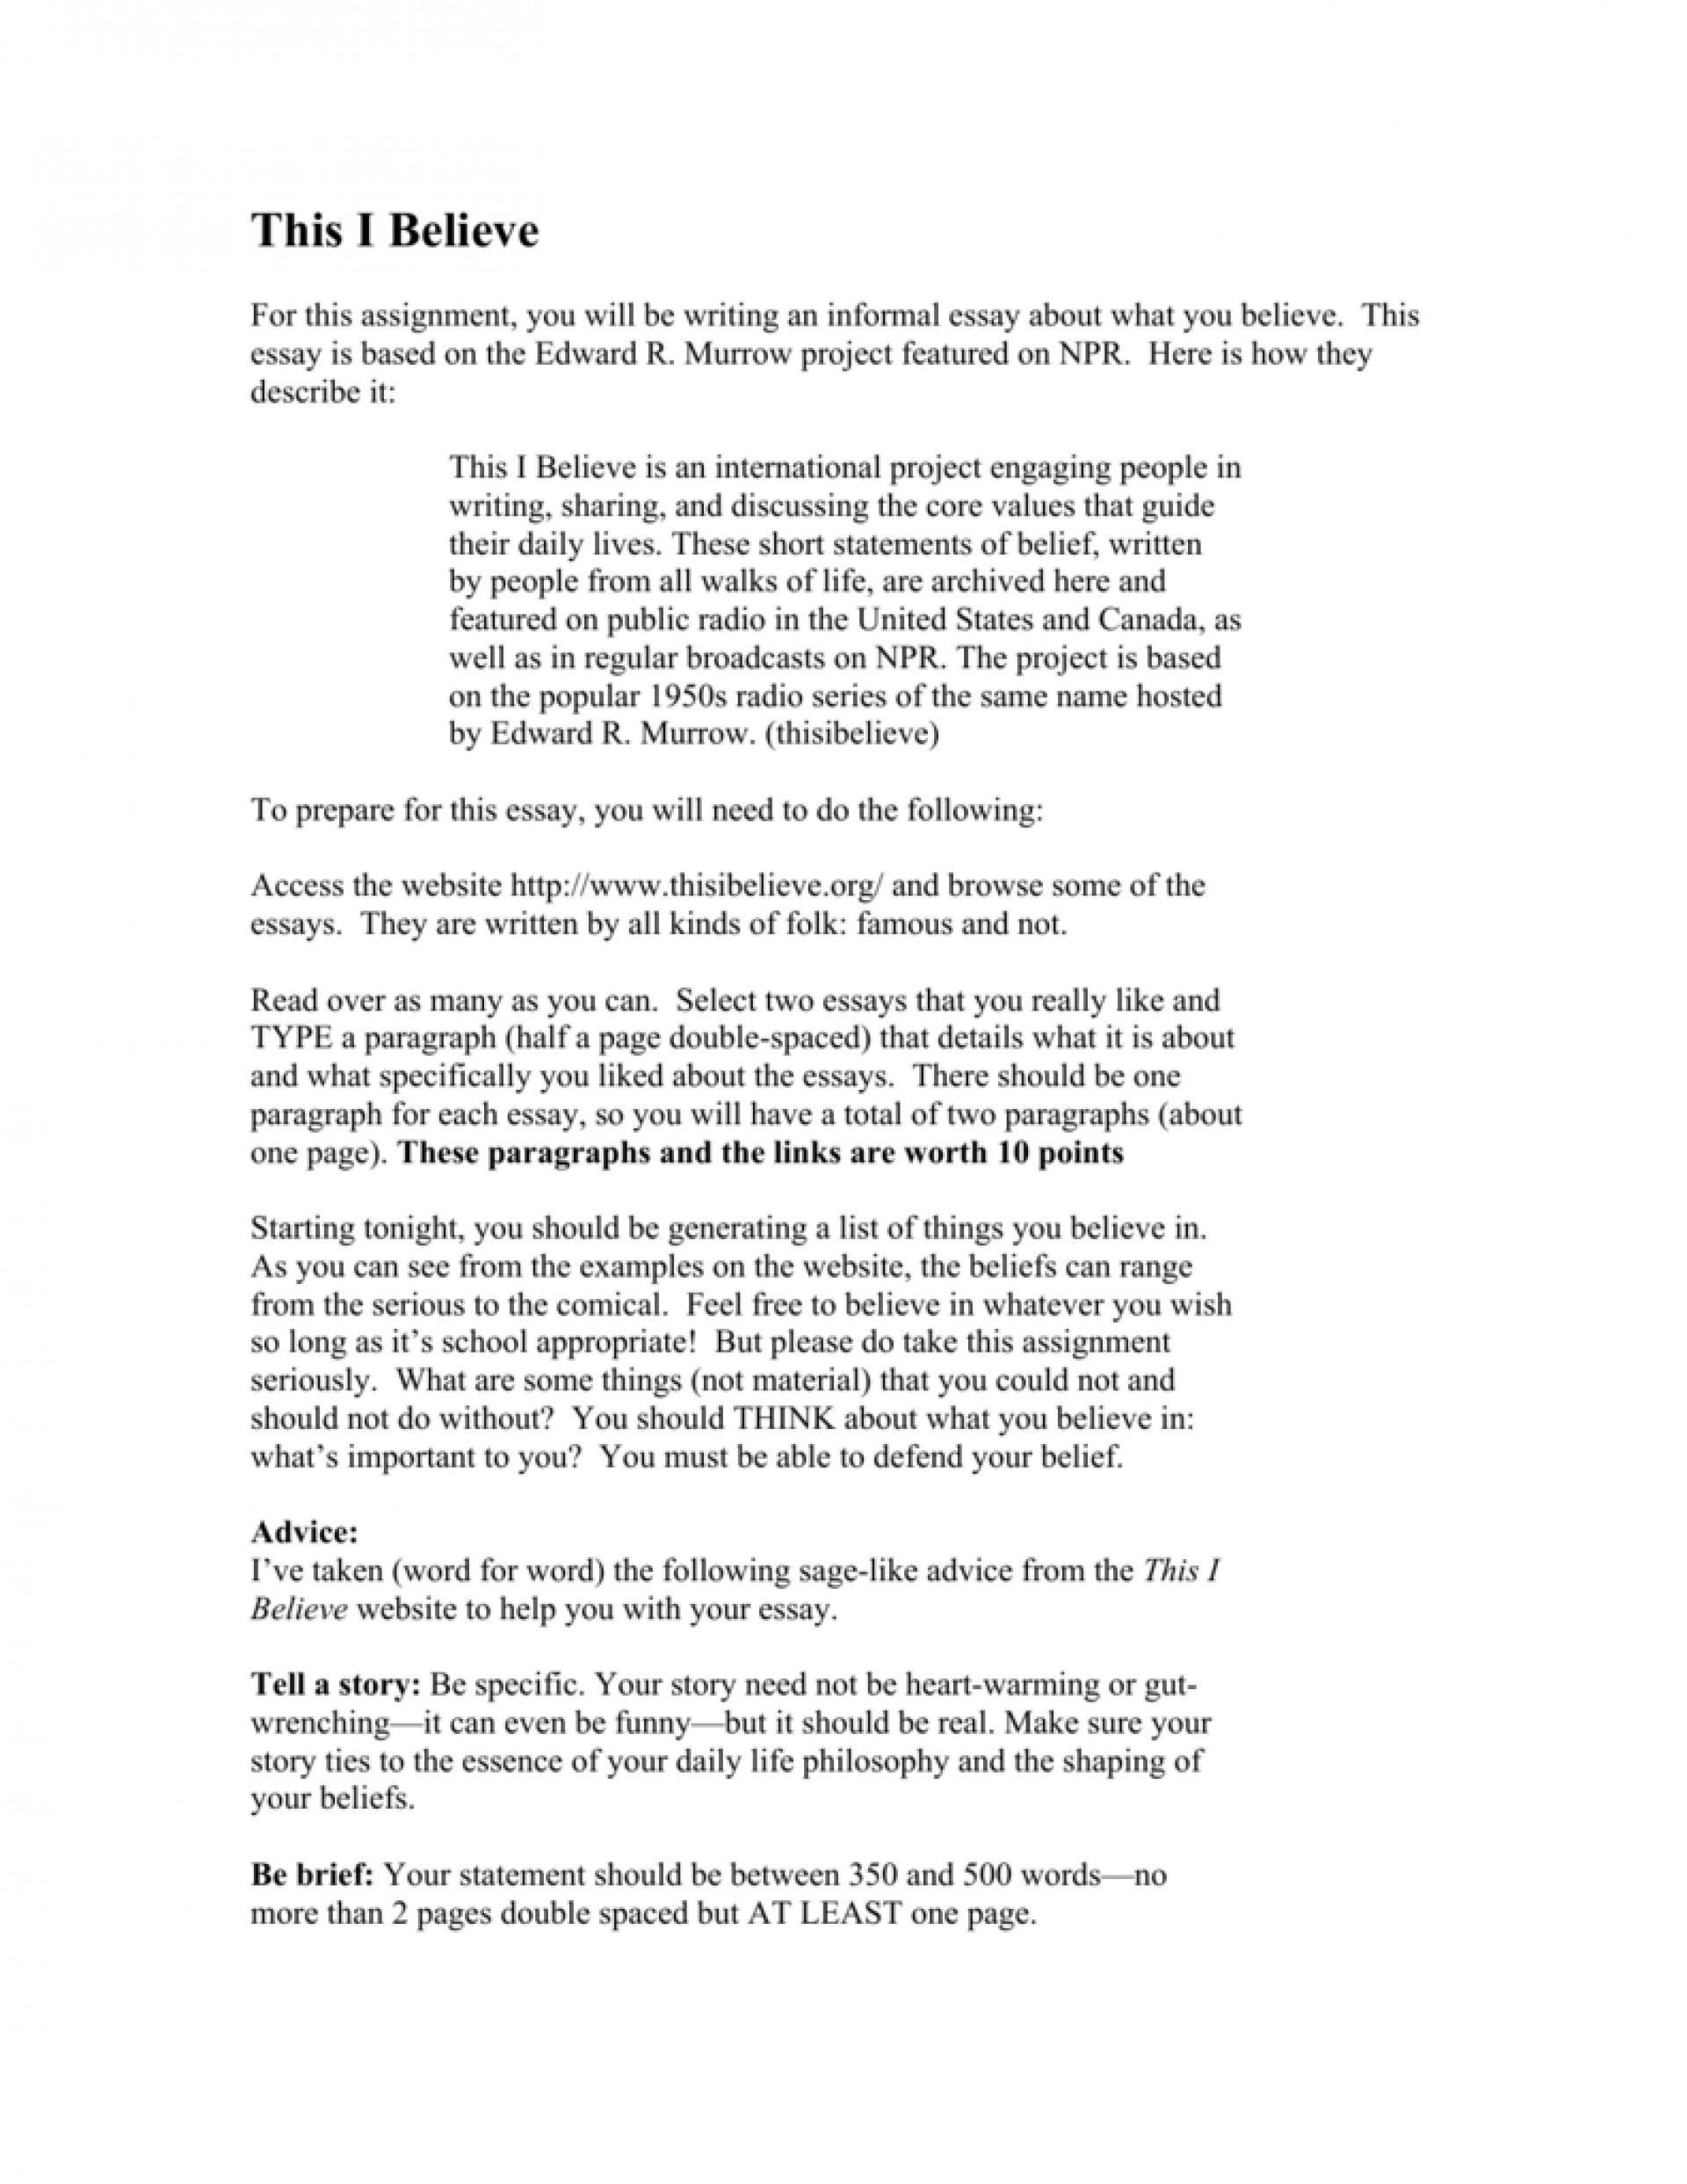 012 I Believe Essay 008807220 1 Impressive This Examples College Rubric Format 1920